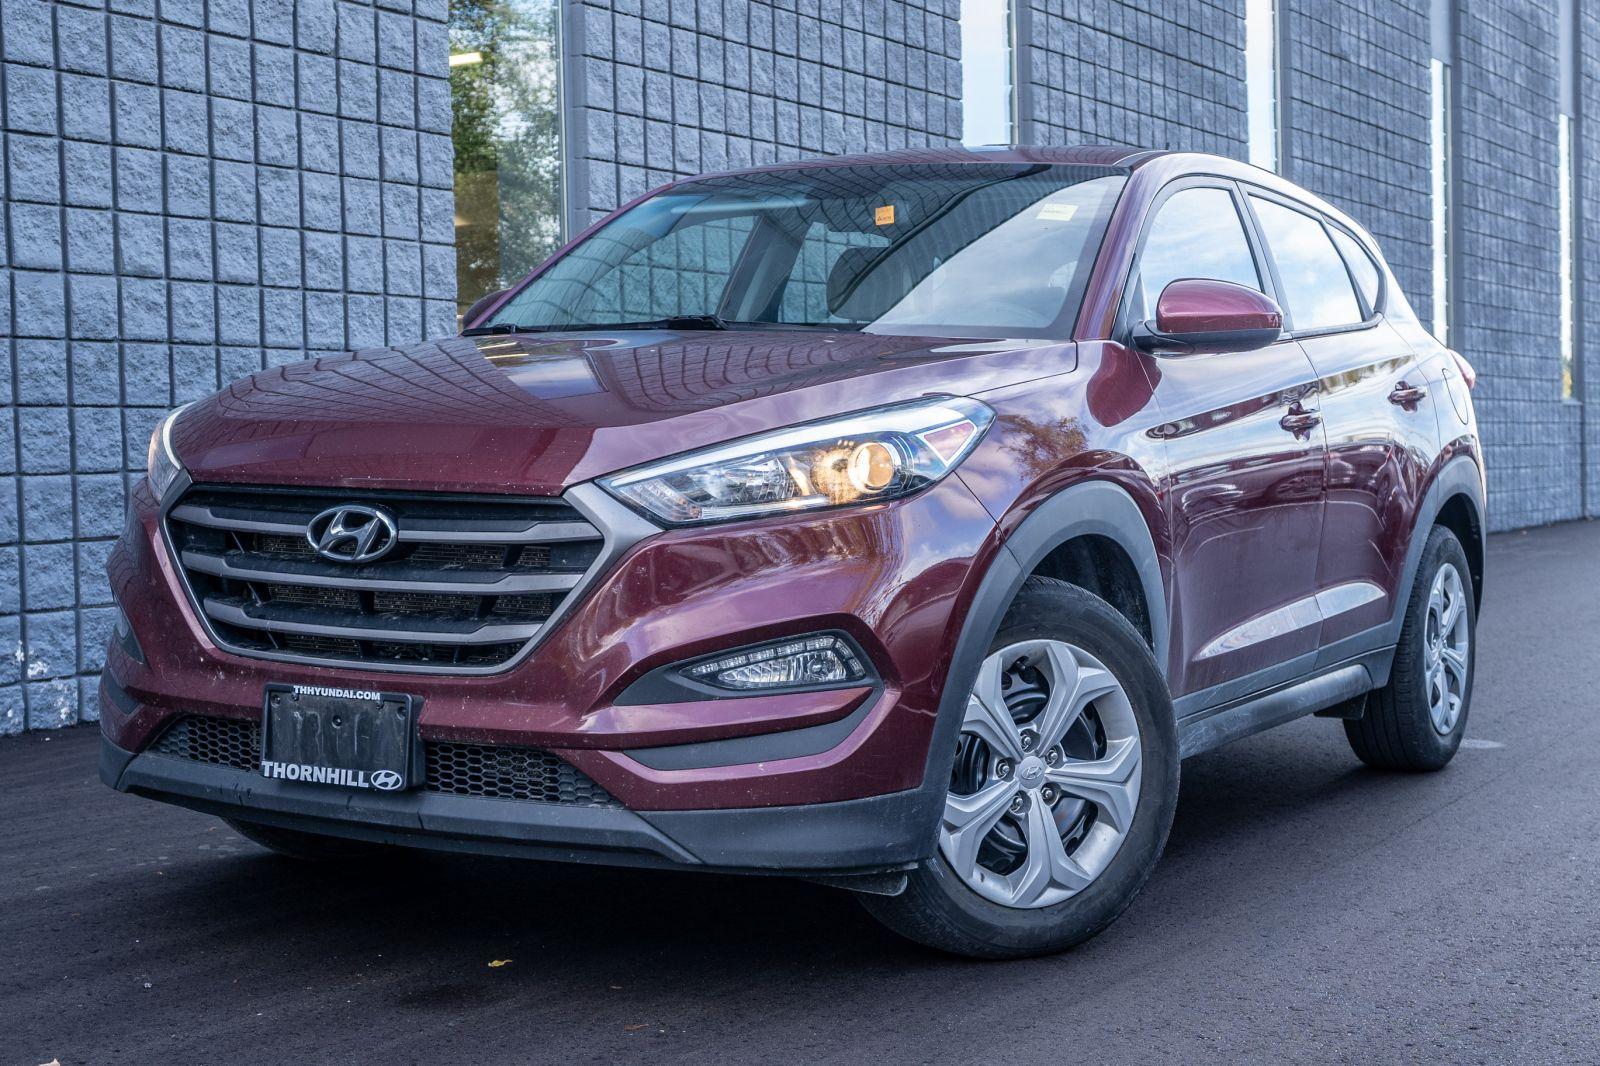 2016 Hyundai Tucson Image